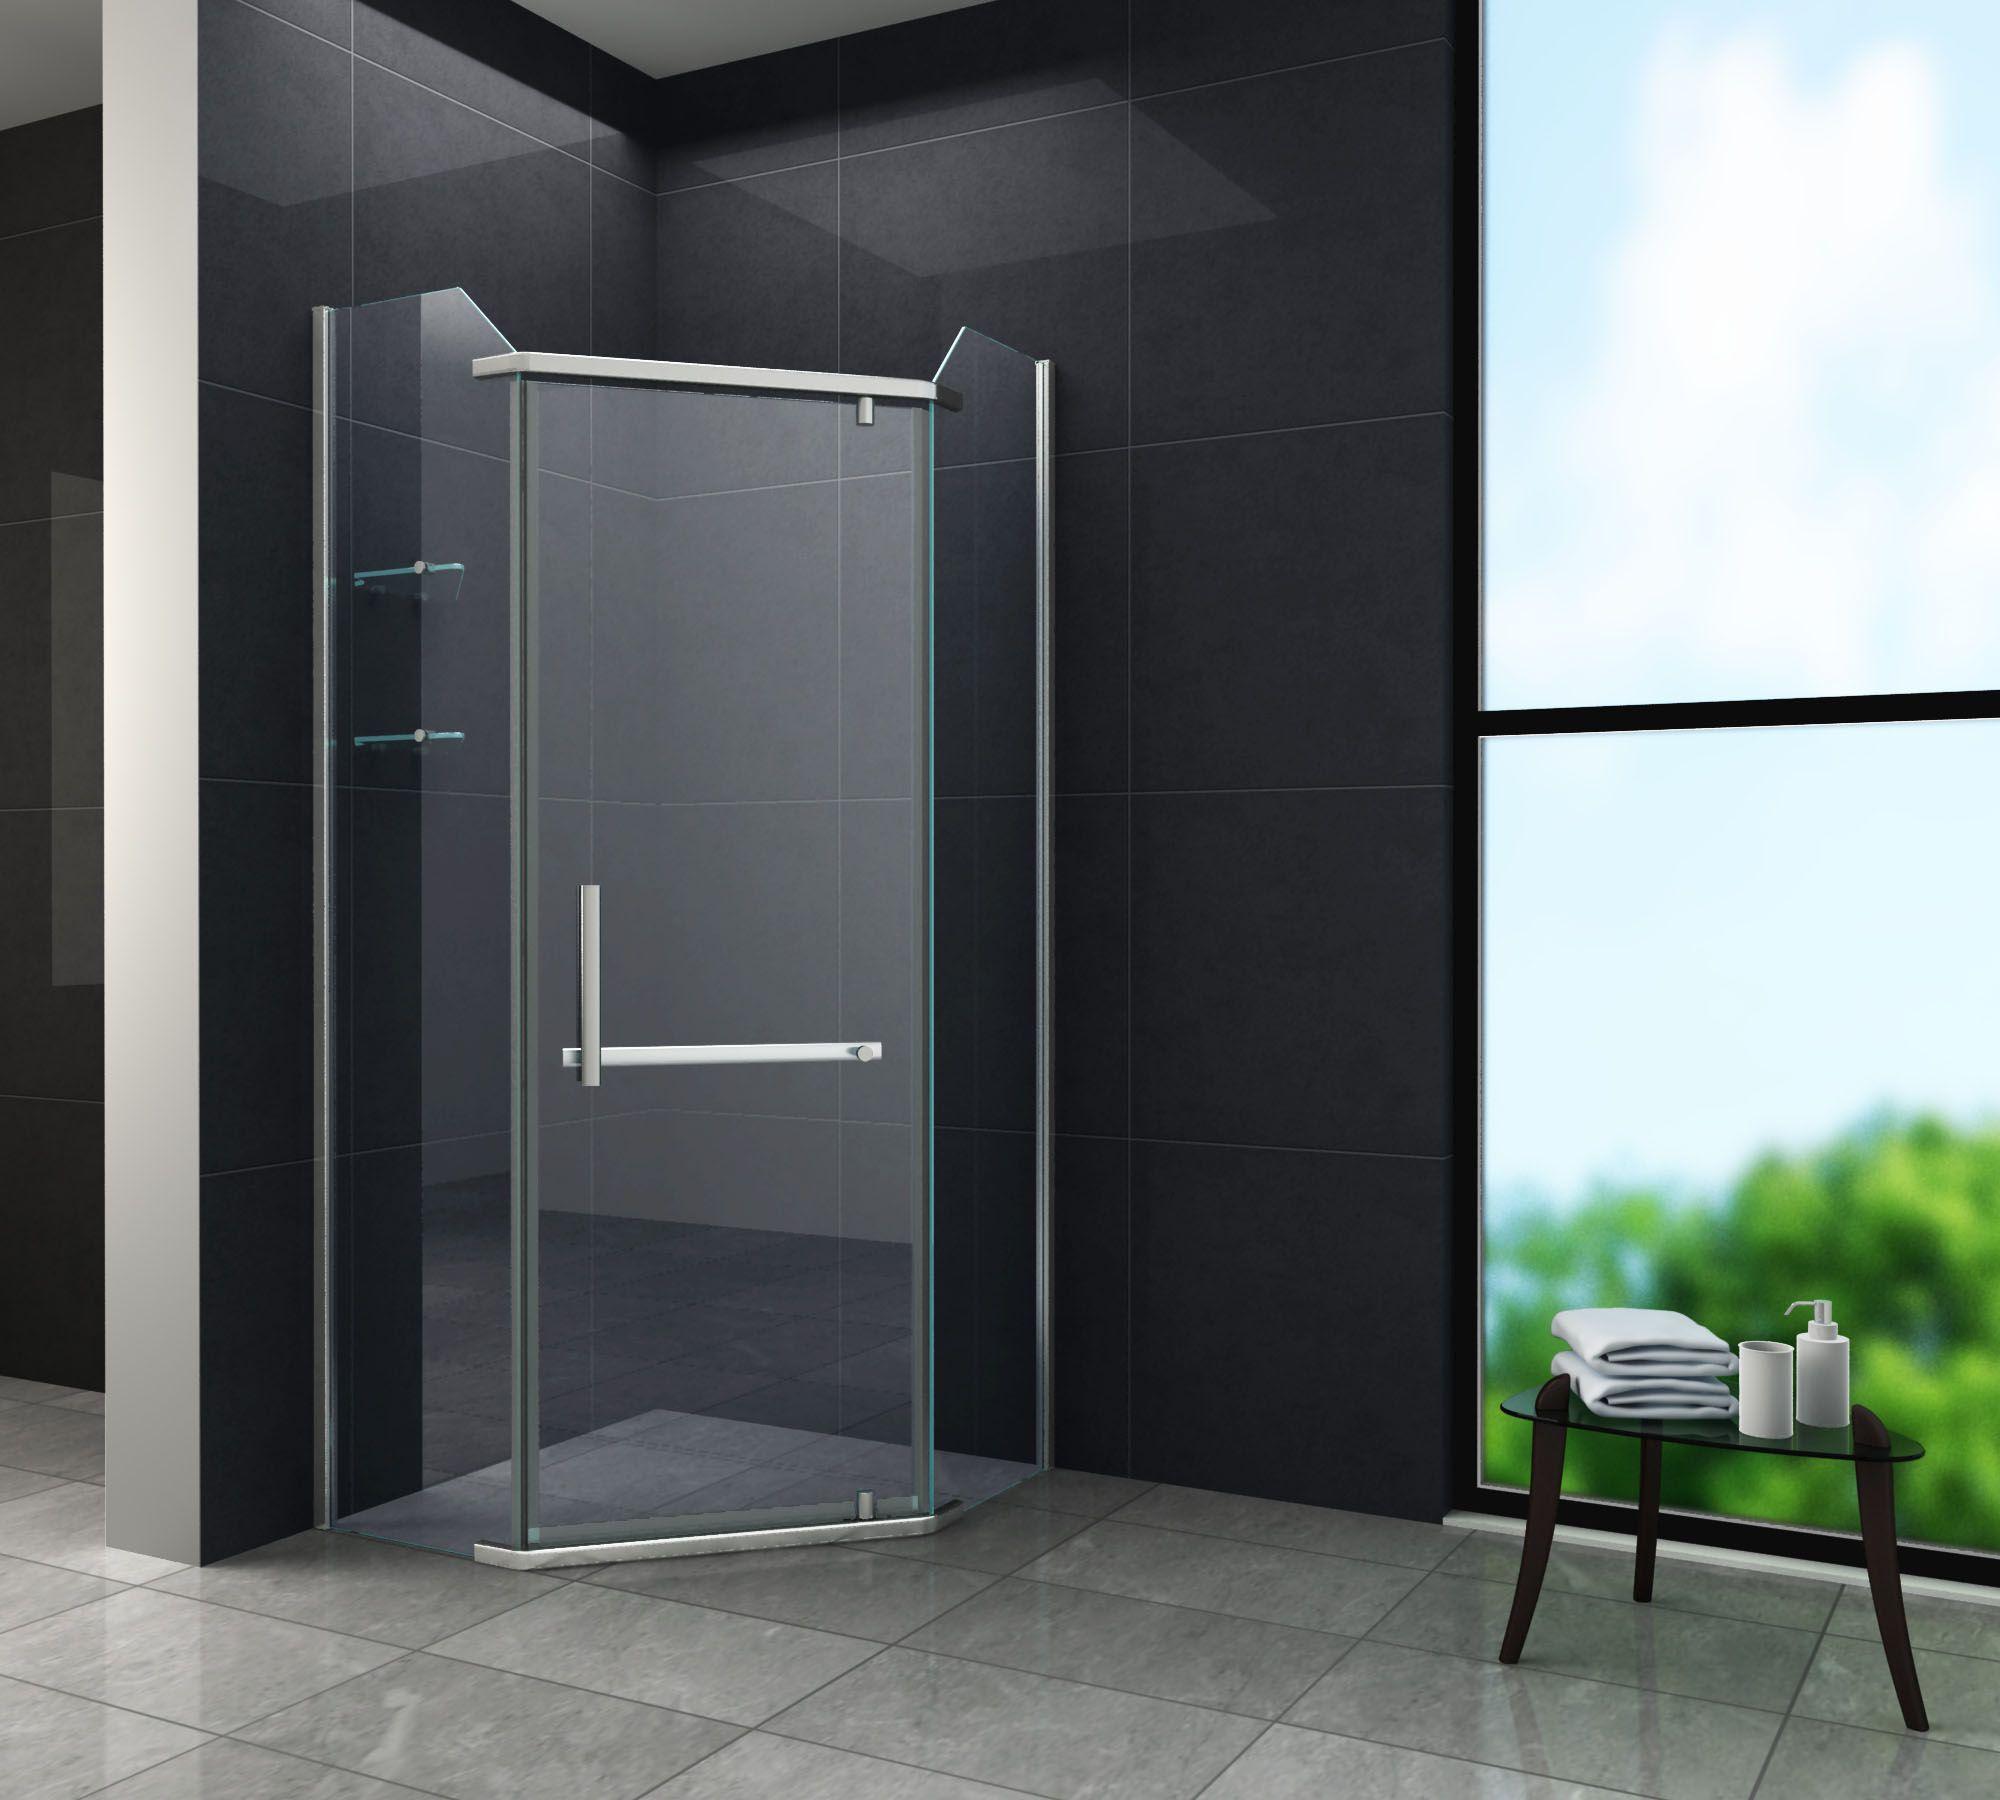 Fünfeck-Duschkabine PENTAGONO 90 x 90 x 200 cm inkl. Duschtasse